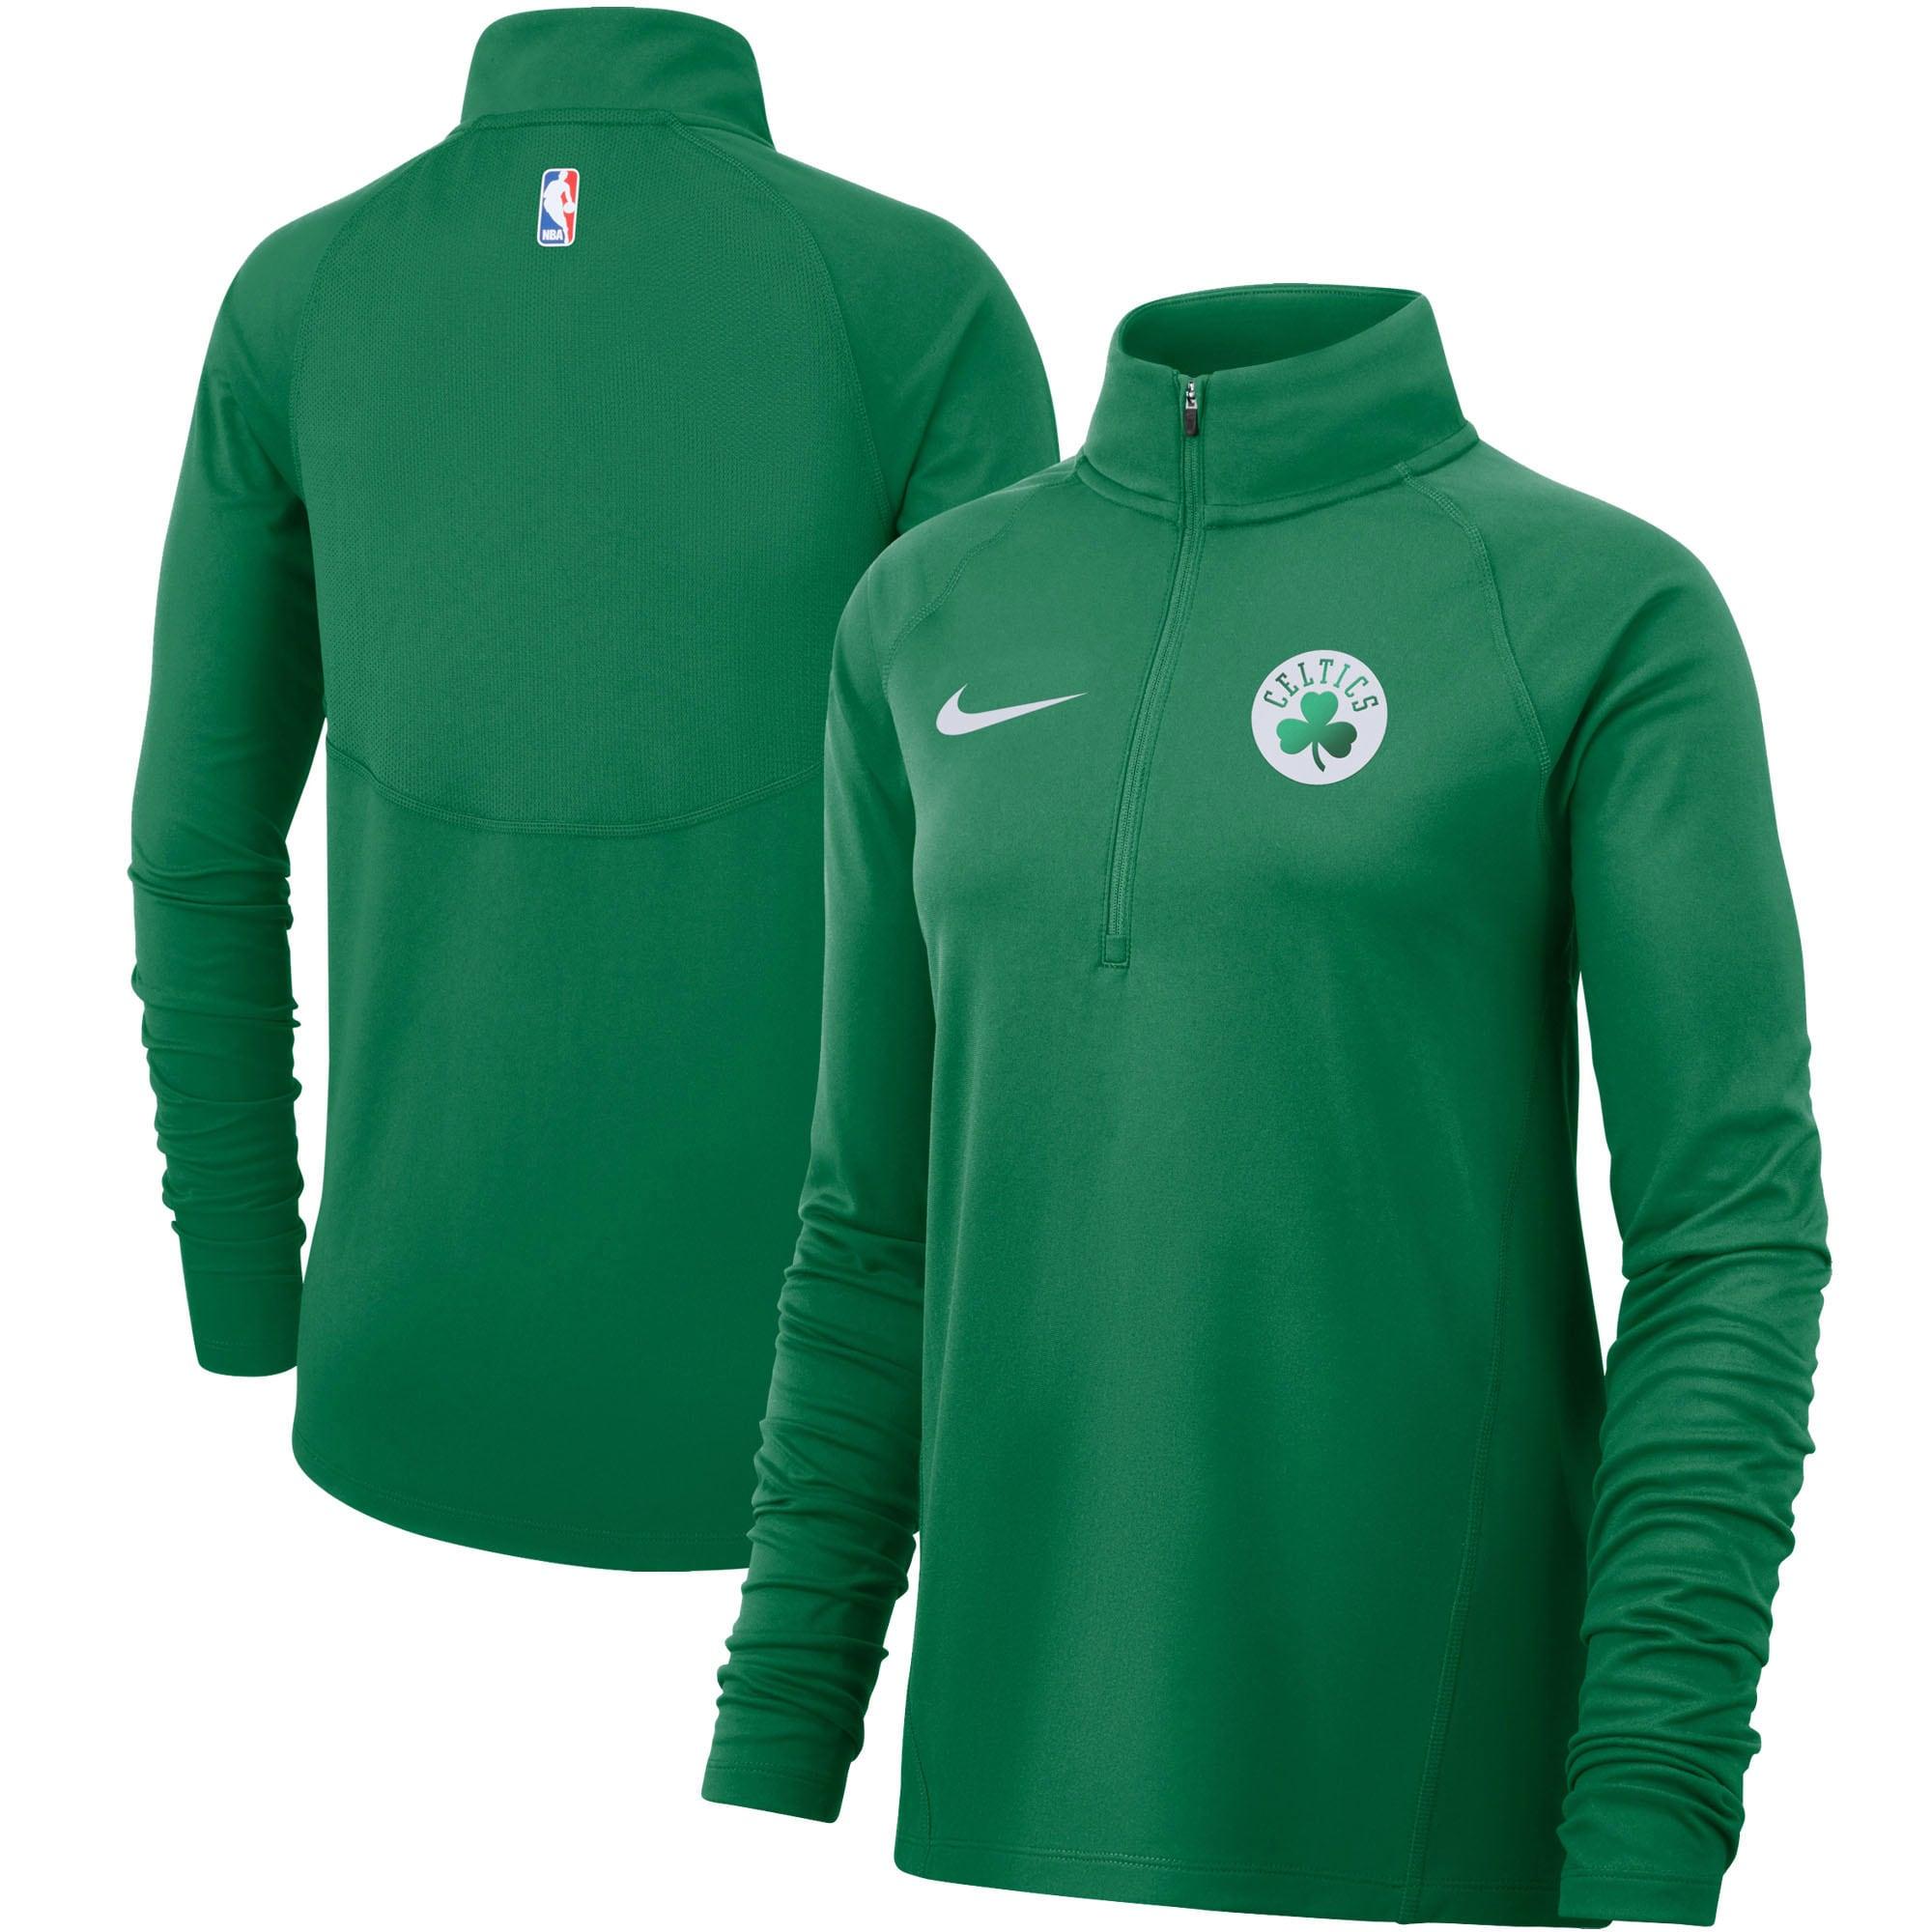 Boston Celtics Nike Women's Element Performance Raglan Sleeve Half-Zip Pullover Jacket - Kelly Green